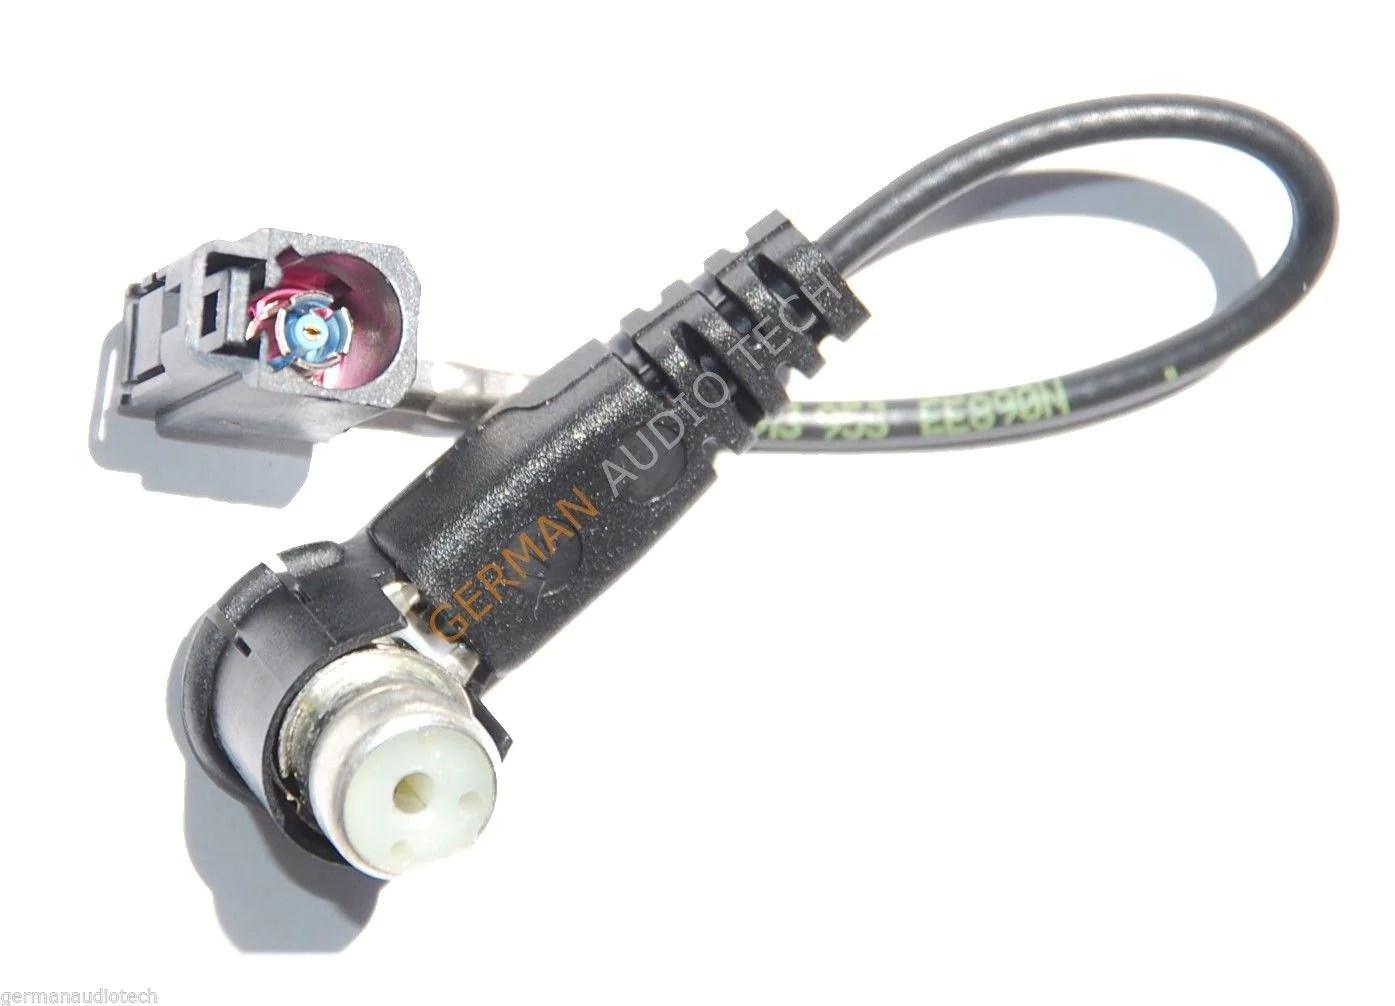 medium resolution of antenna adapter for bmw radio harness cable business cd mini e46 m3 e39 m5 e53 x5